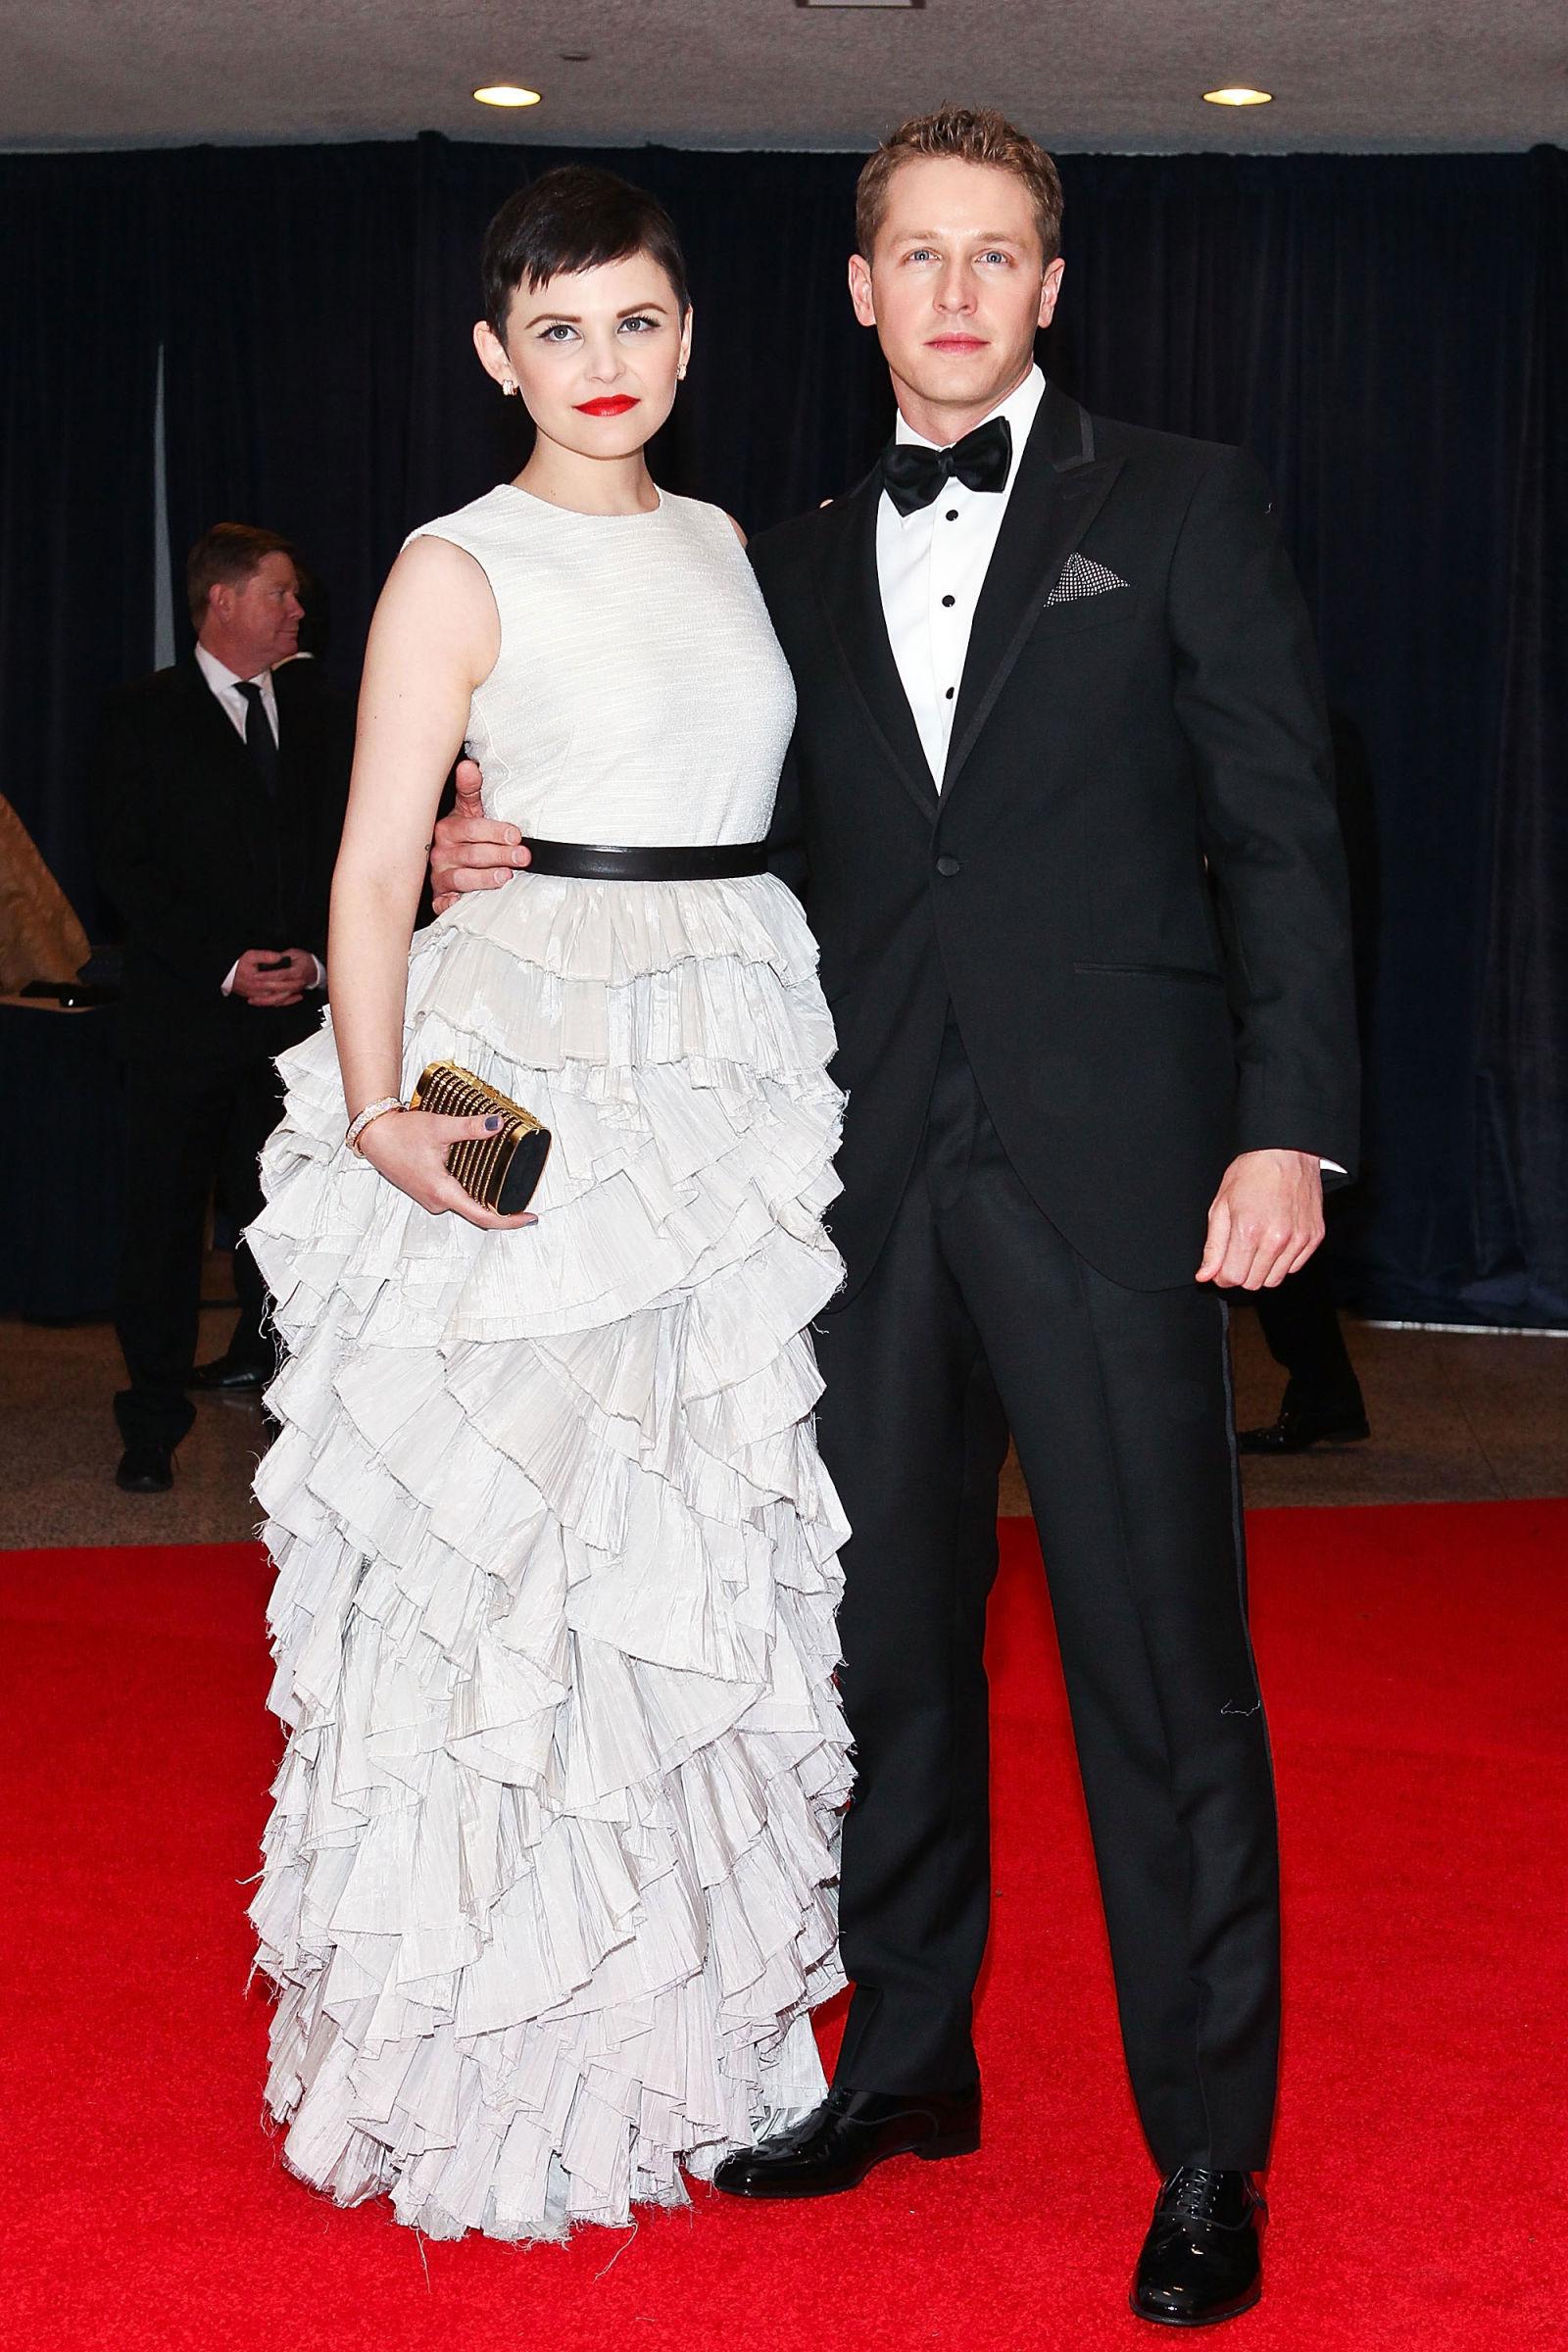 Celebrity Weddings 2014 - Celebrities Who Married in 2014